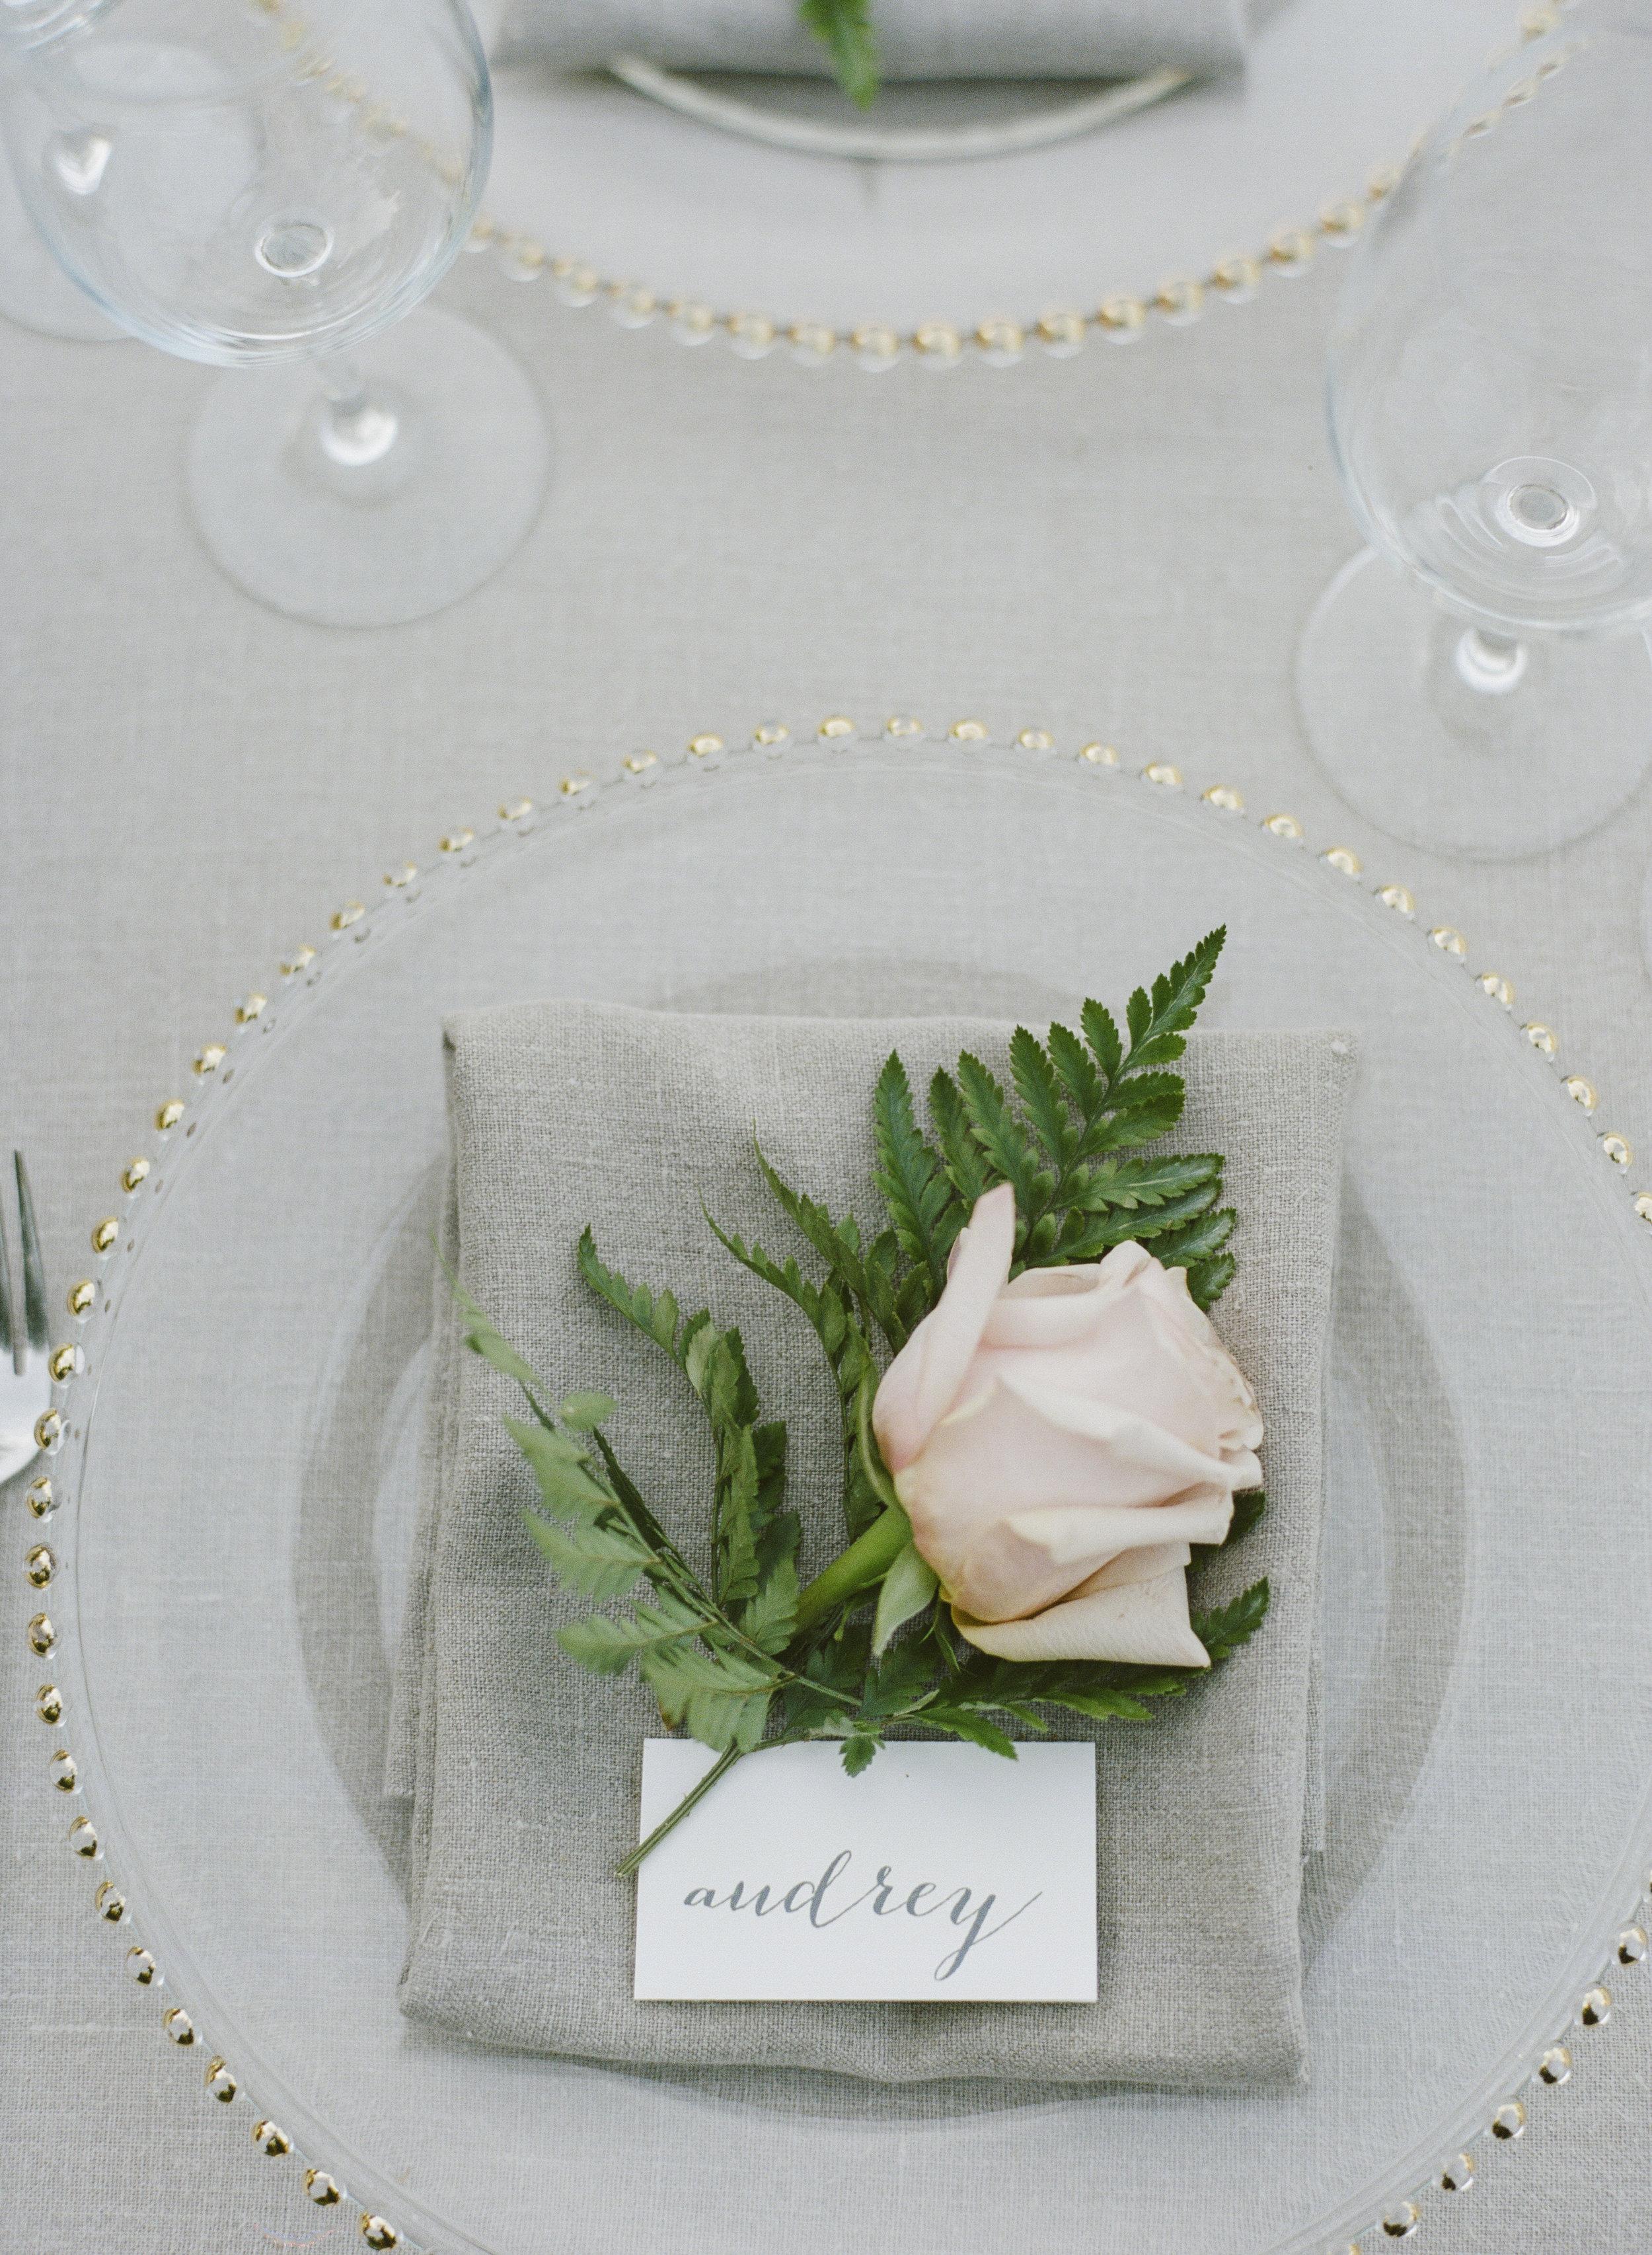 Violette-fleurs-roseville-sacramento-california-Flower-farm-inn-wedding-florist-spring-tablescape-blush-peach-detail-shots-closeups.jpg